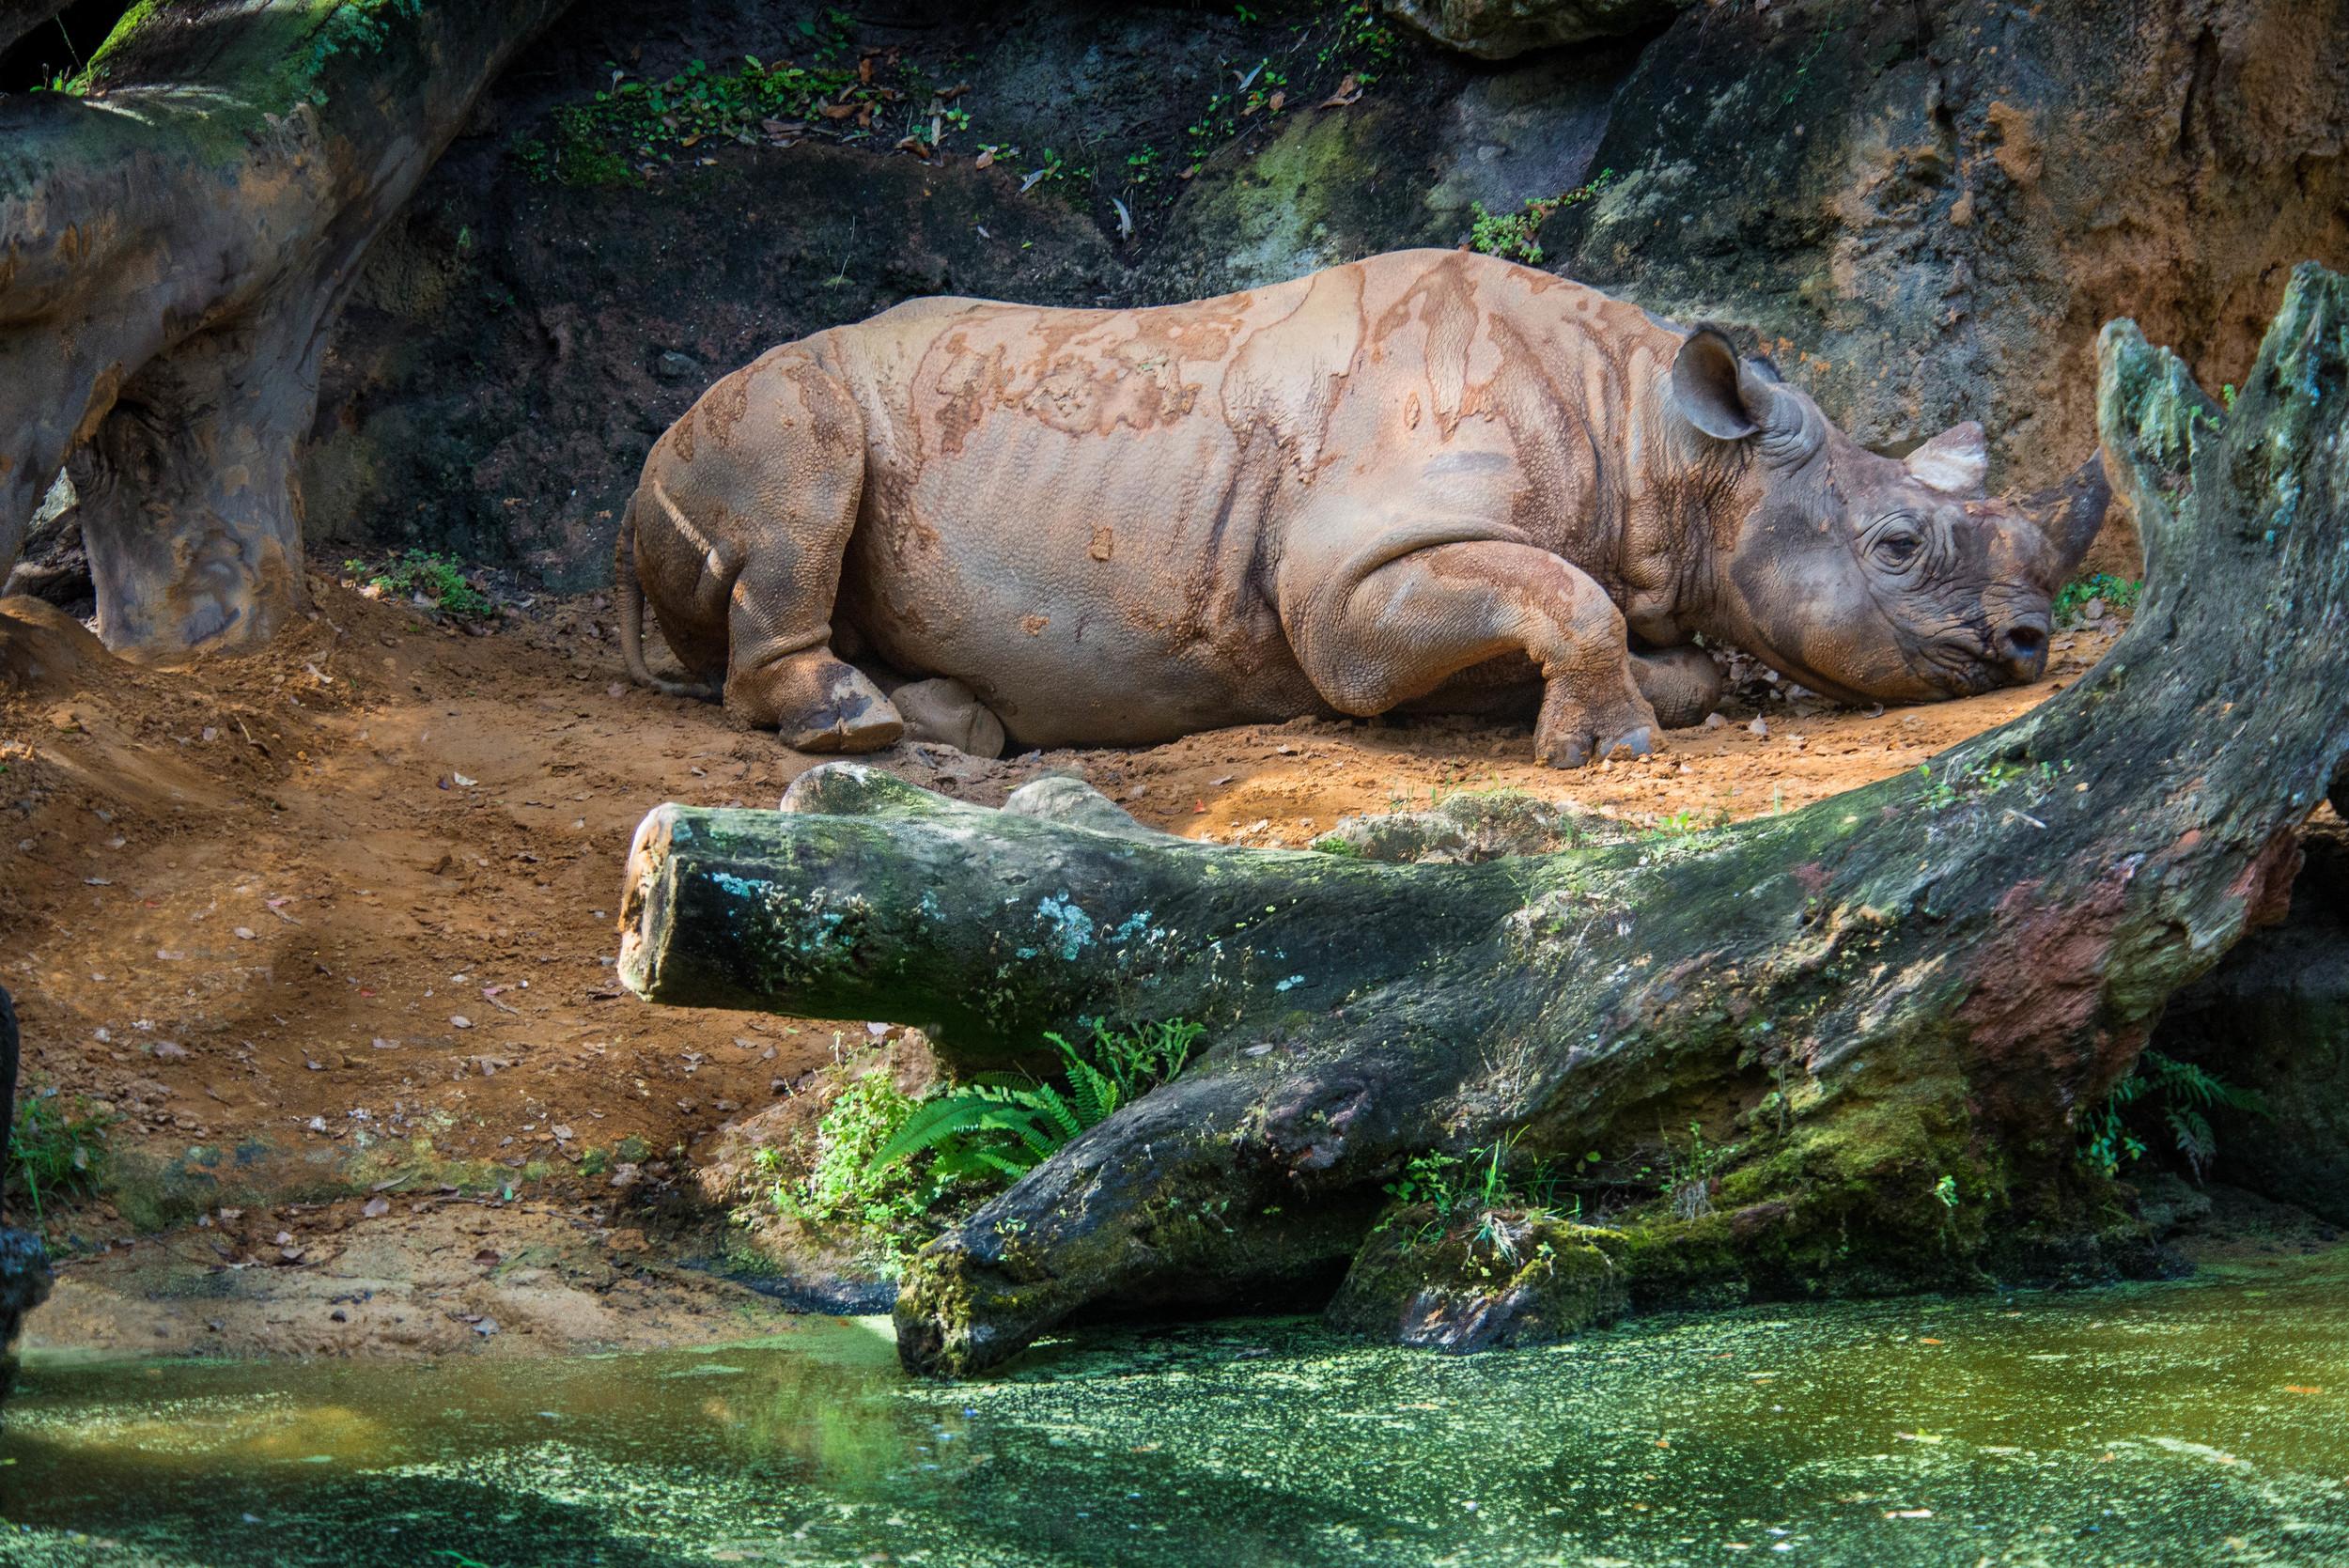 Rhino at Rest